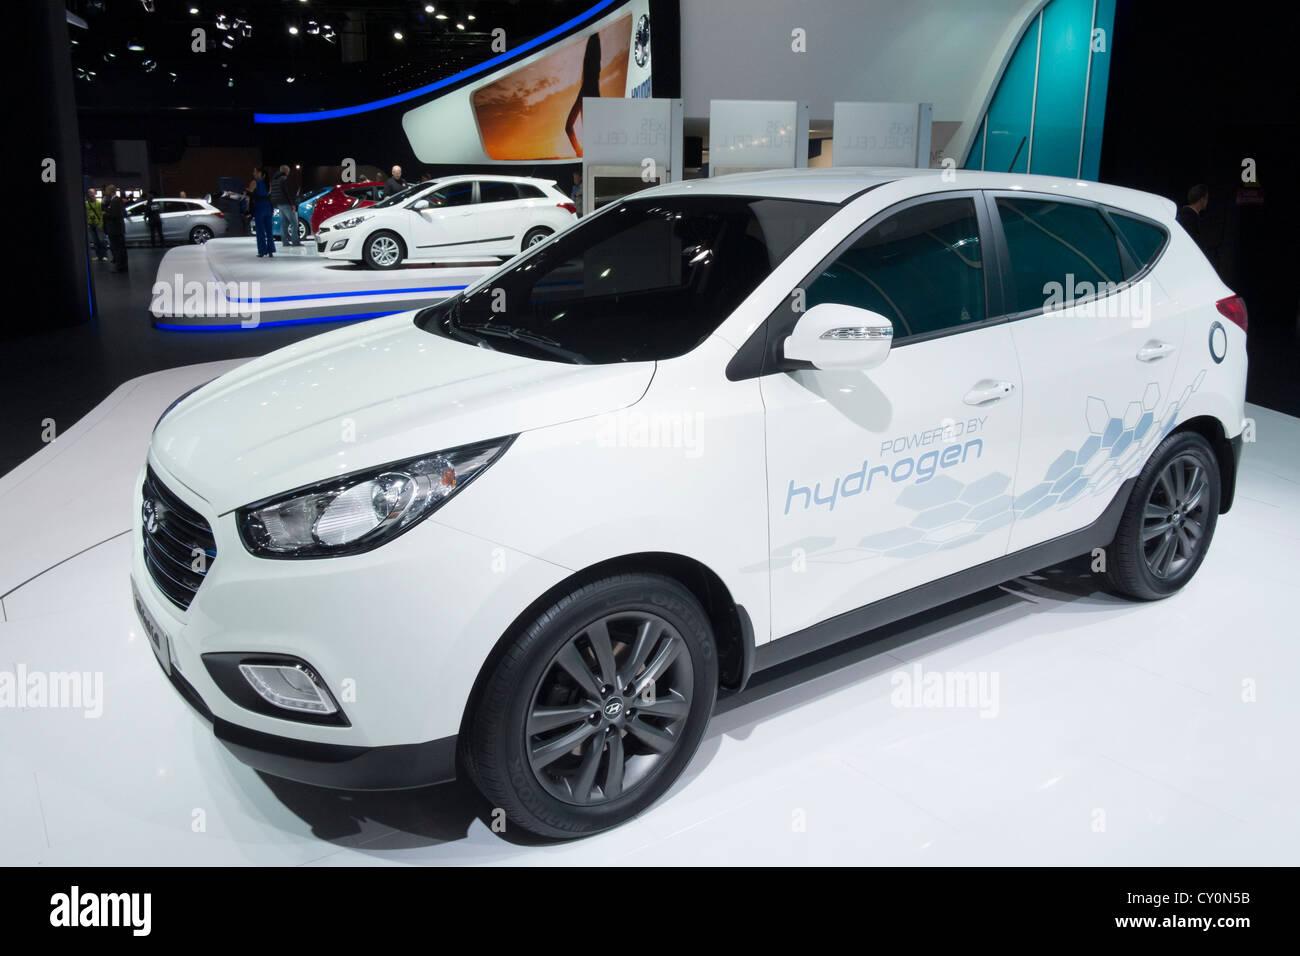 Concepto de la célula de combustible de hidrógeno Hyundai ix35 alquiler en Paris Motor Show 2012 Imagen De Stock